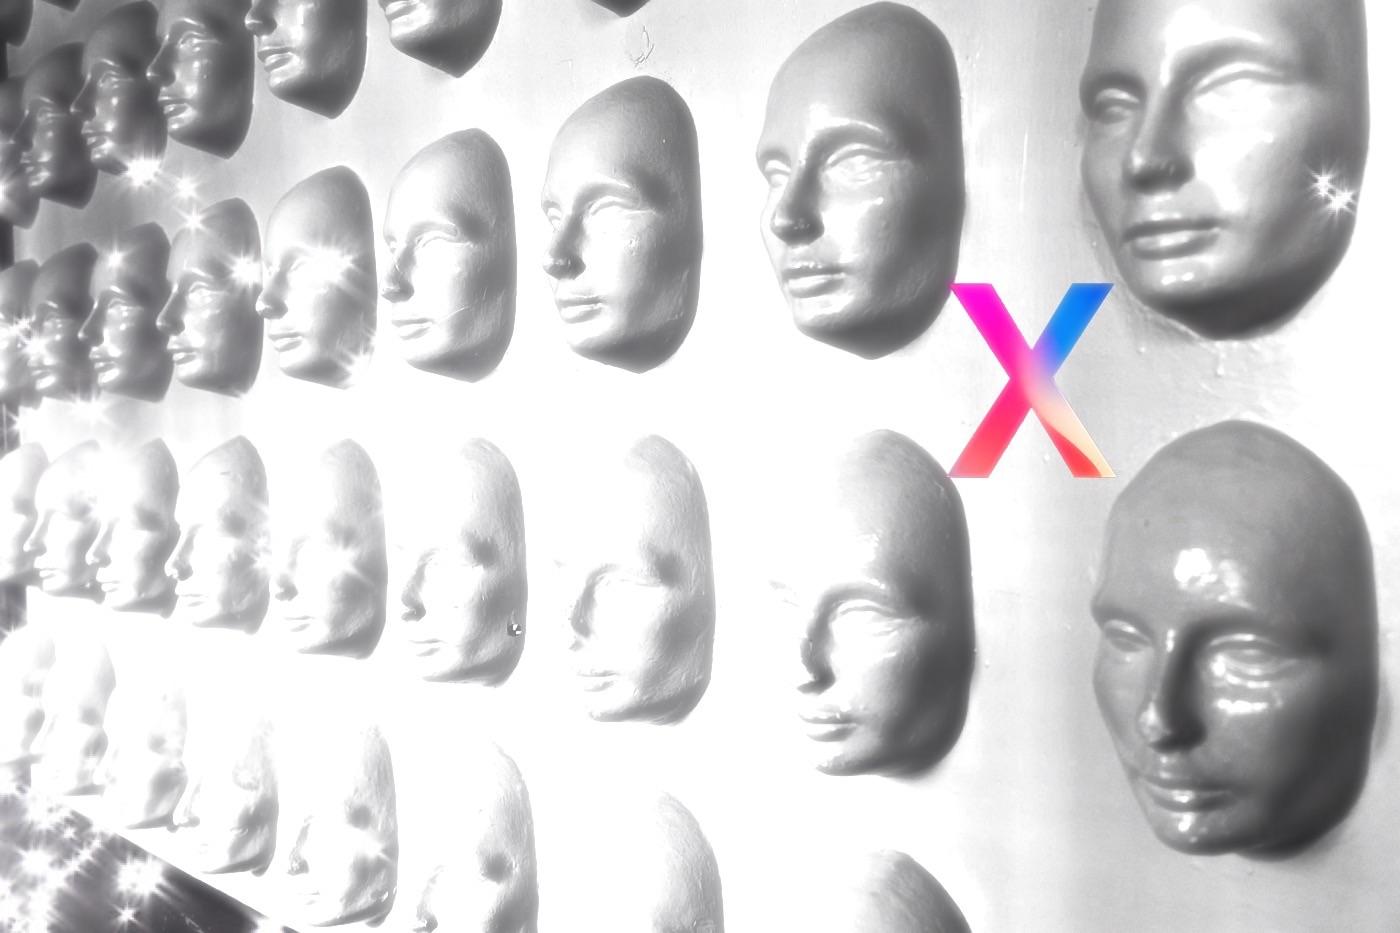 VIP Pass To The ℭpirit World DISCLOSURE REVEALS FUTURE - Siris human face finally revealed